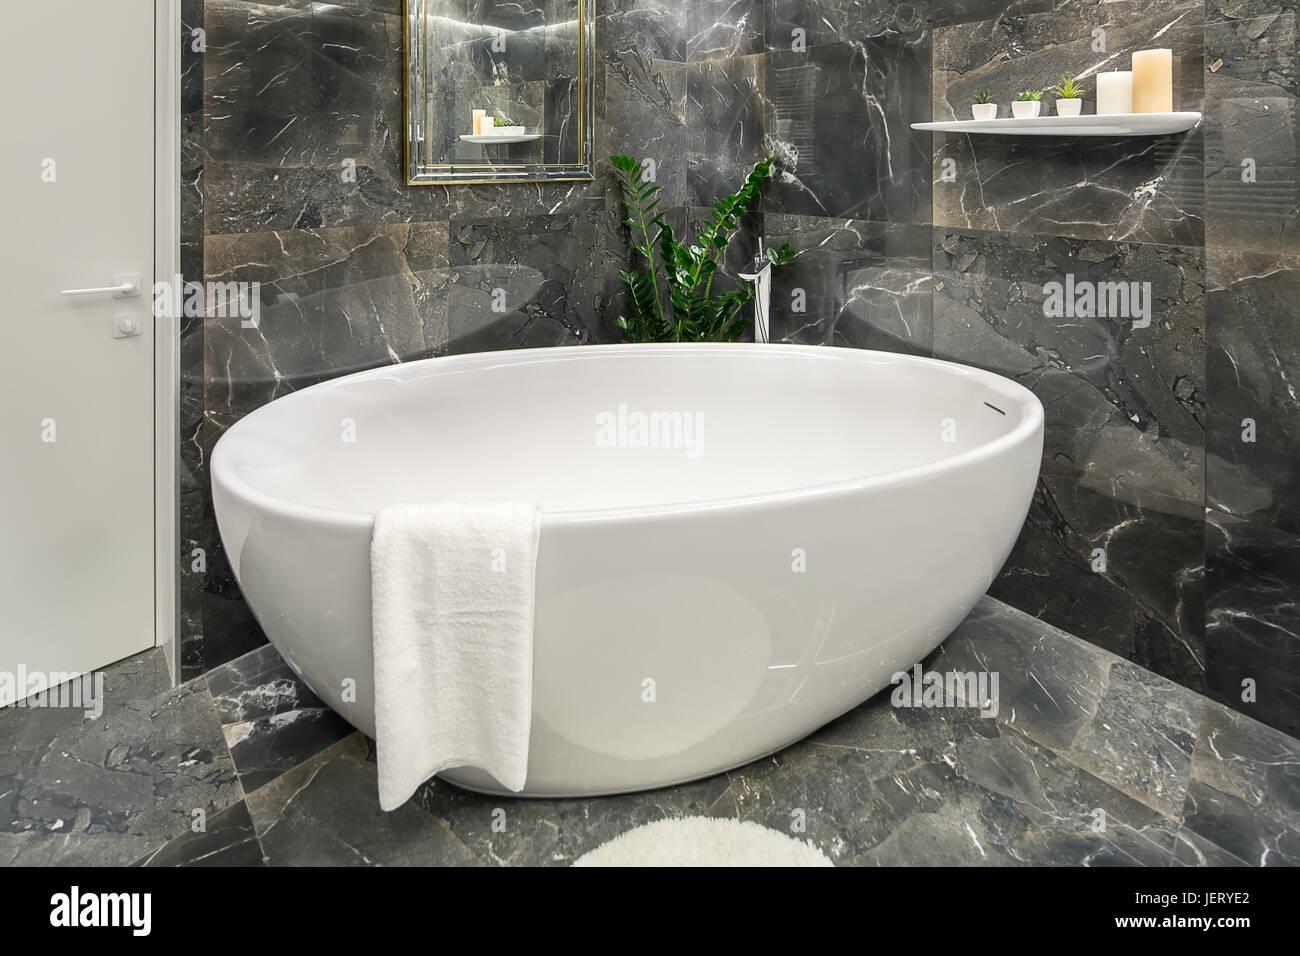 Vasca Da Bagno Di Inglese : Vasca da bagno stile inglese idee di design per la casa